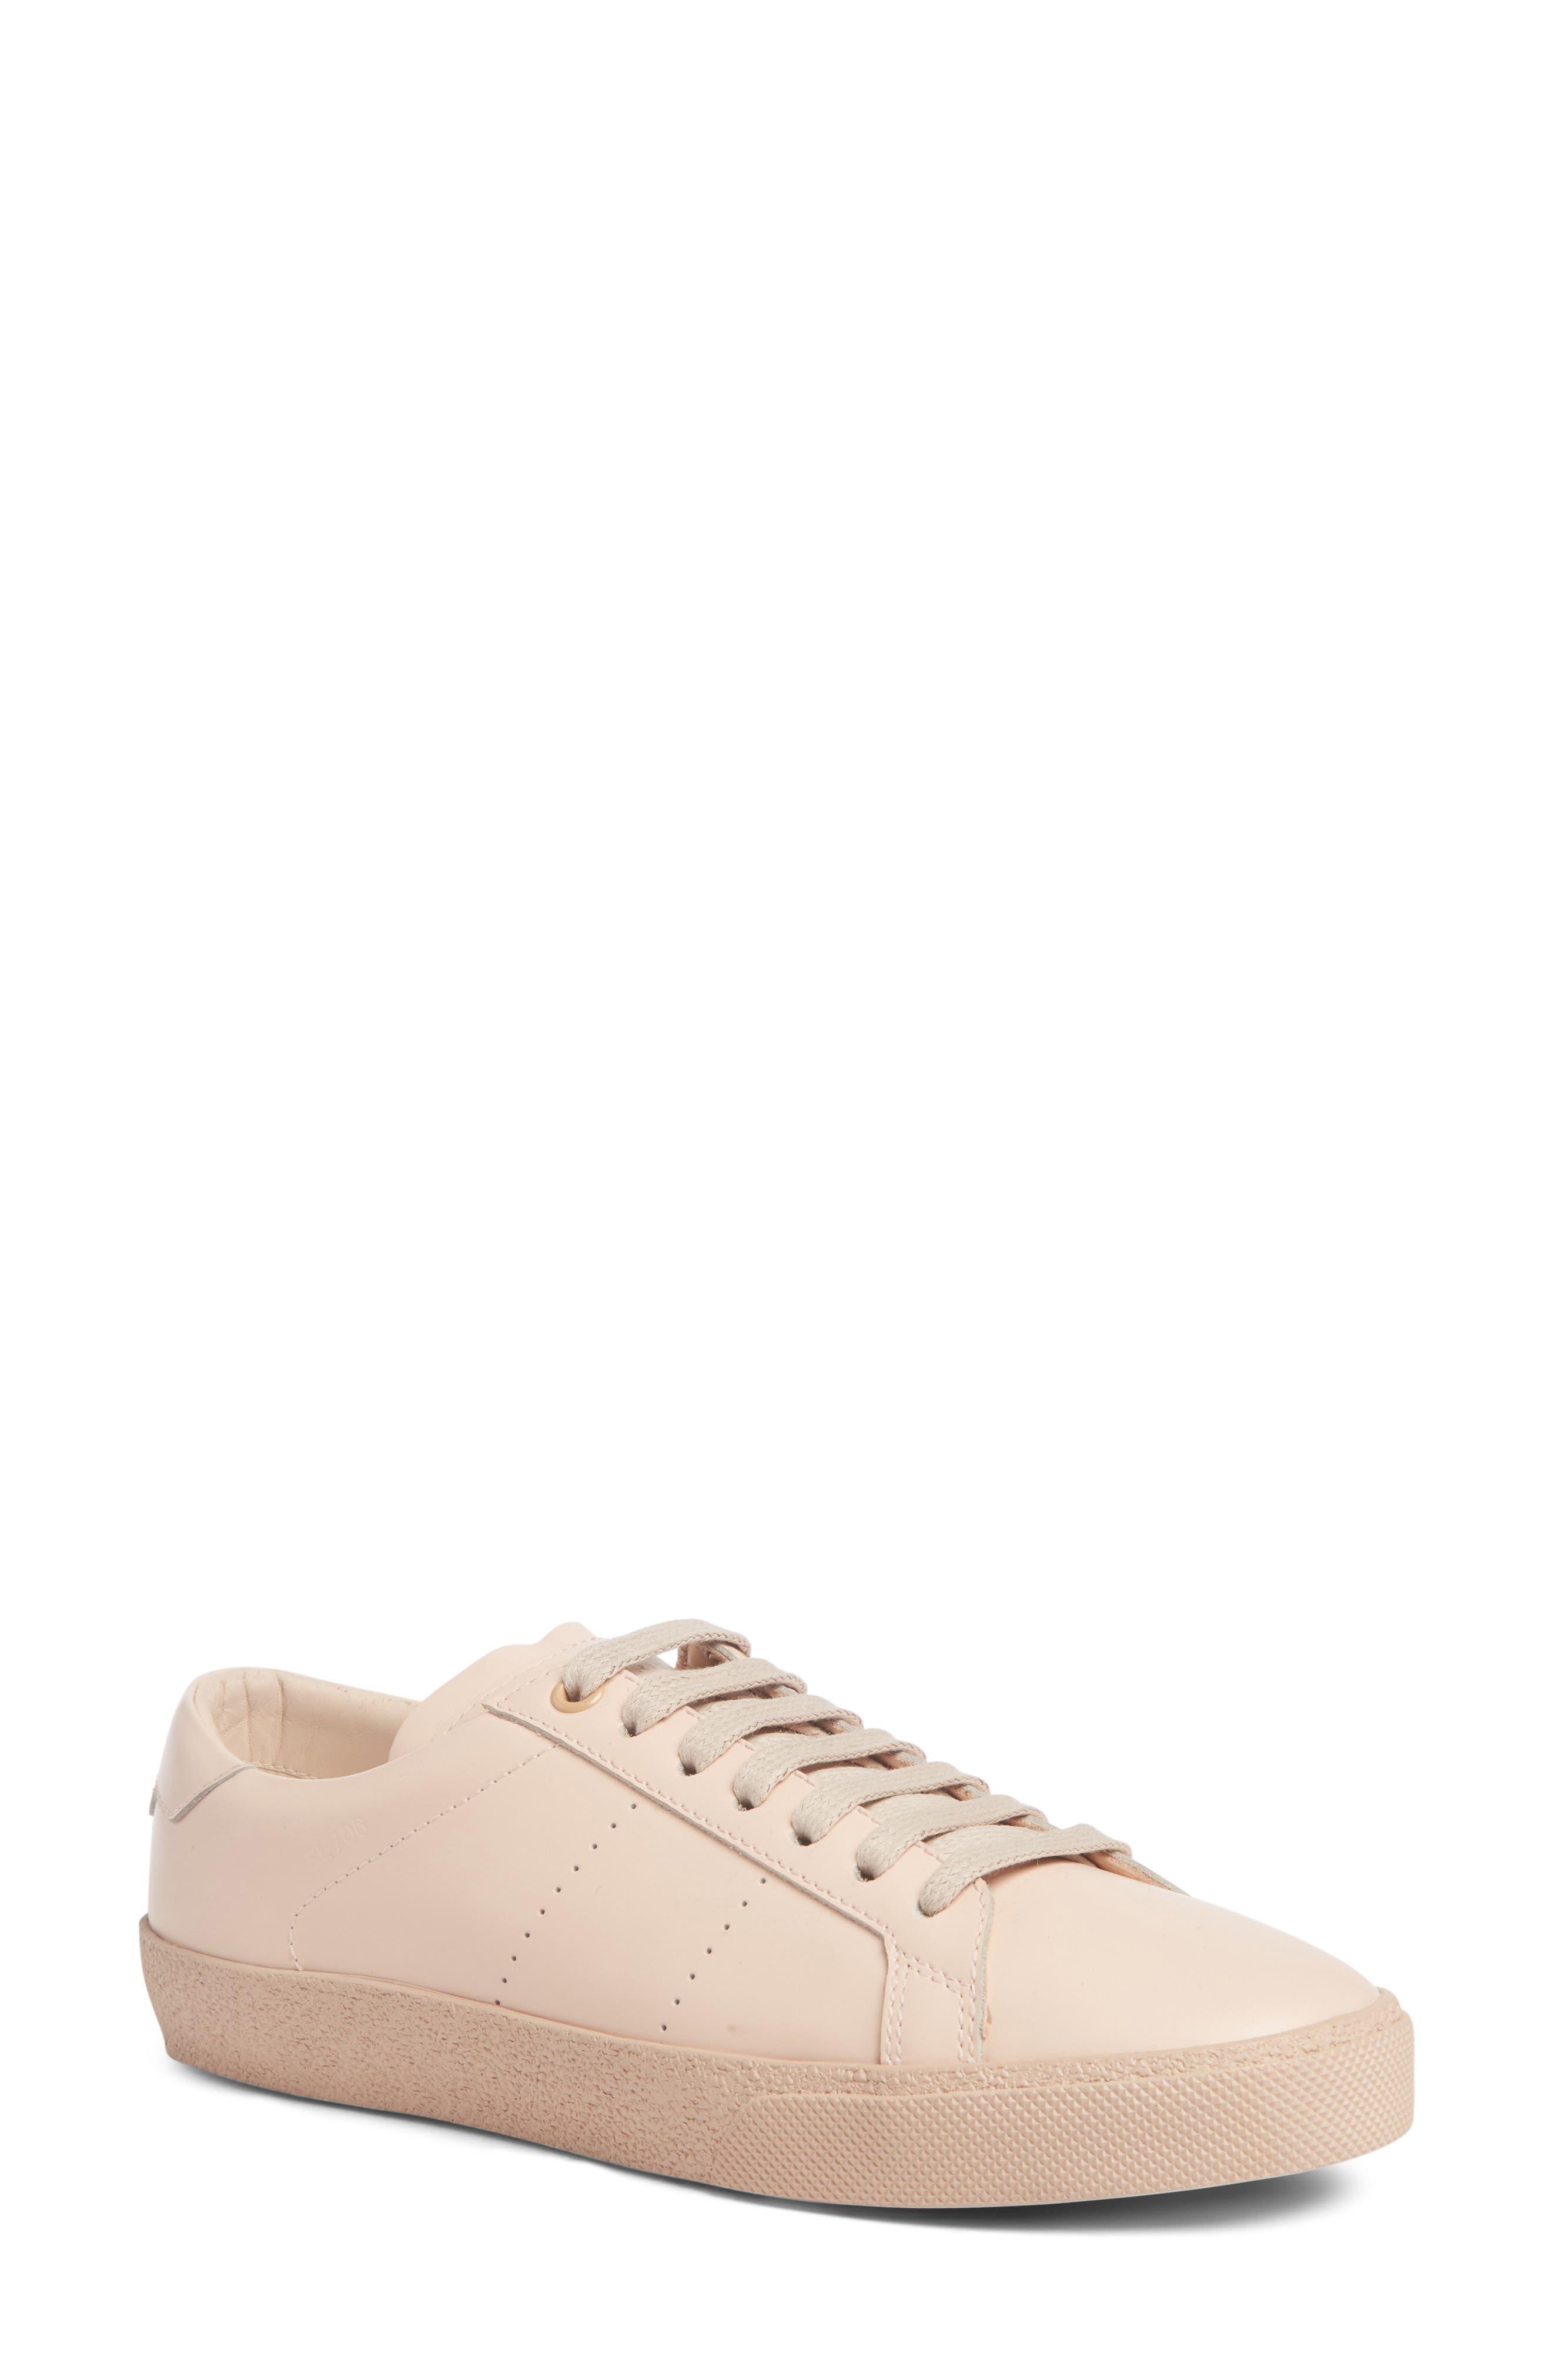 Court Classic Sneaker,                             Main thumbnail 1, color,                             650